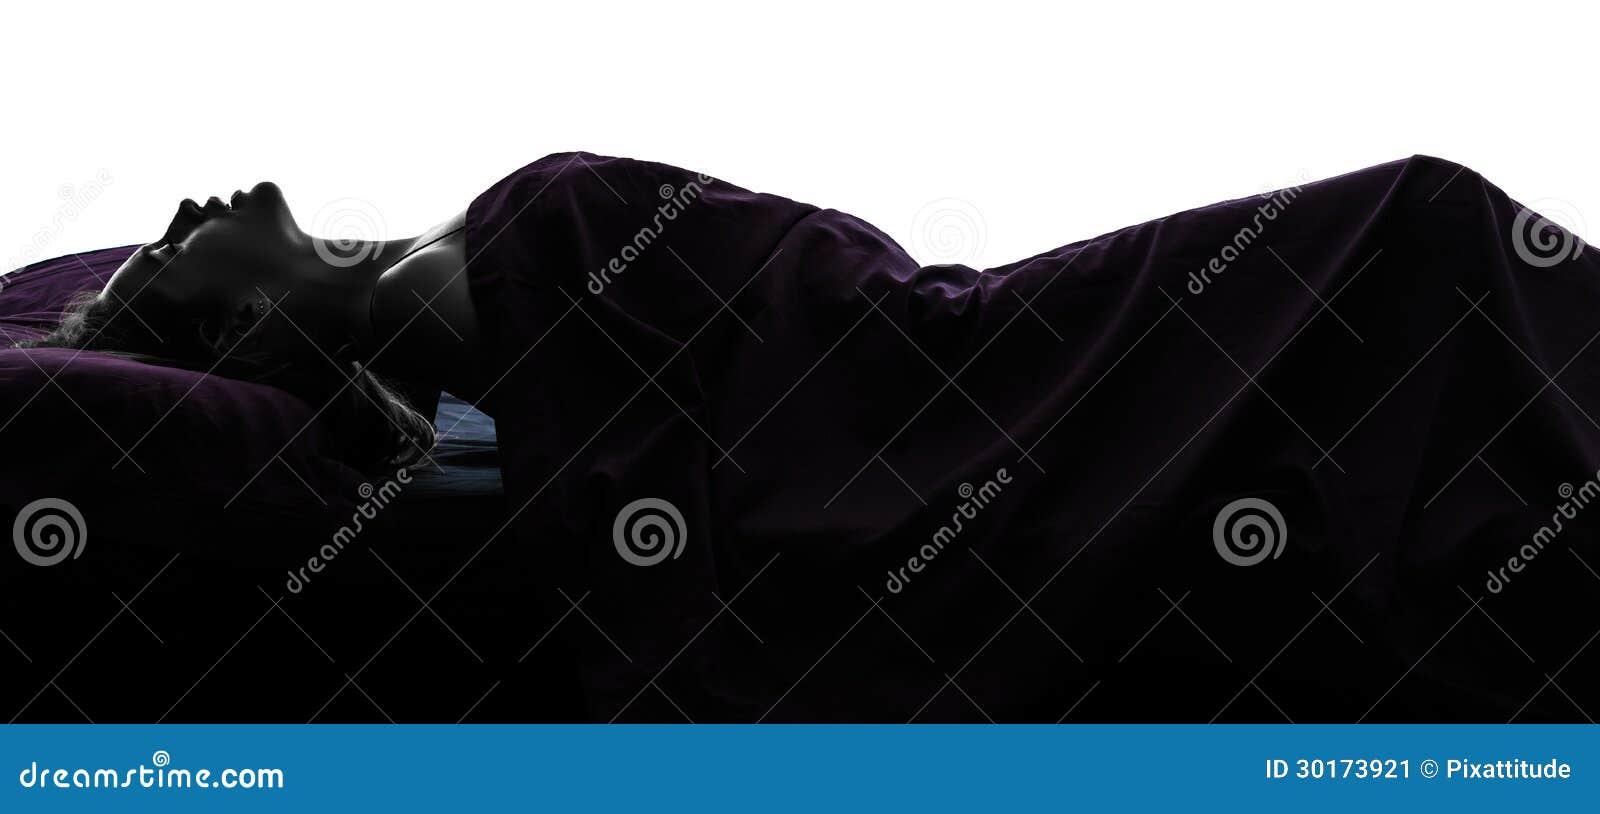 Femme se masturbant en silhouette de lit image stock for Se balader dans les yvelines